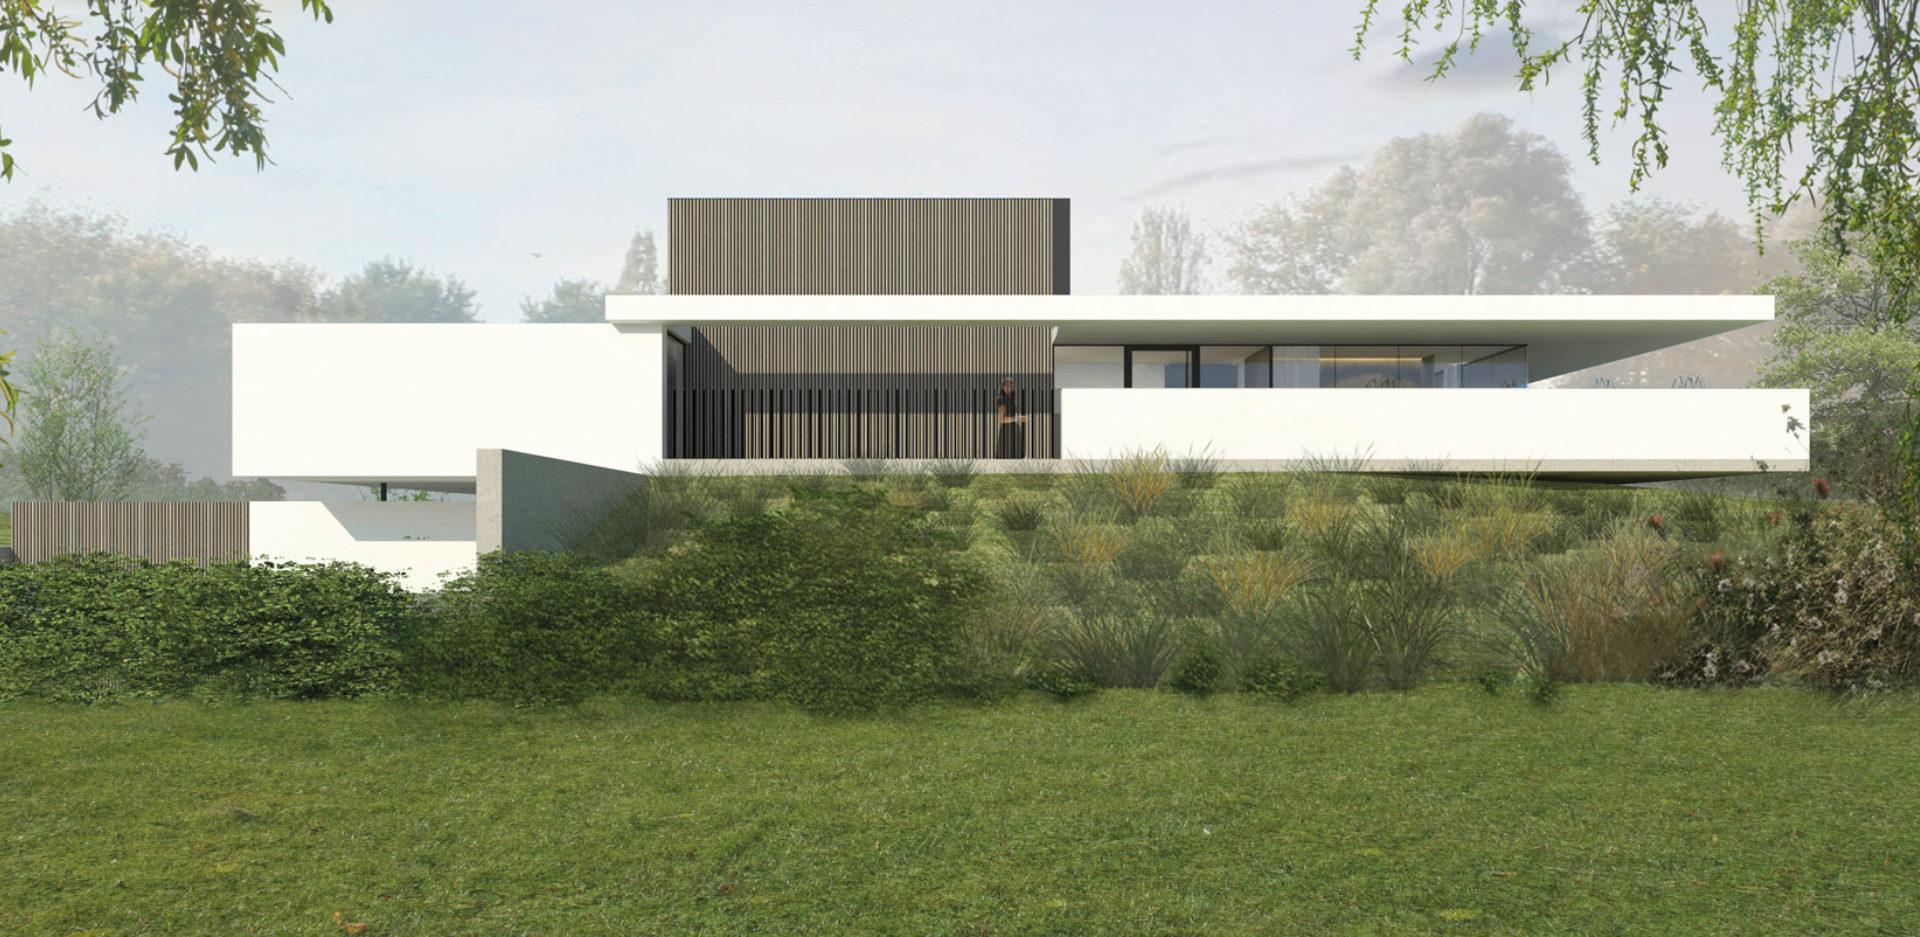 Lafaut Project Villa Simli 01